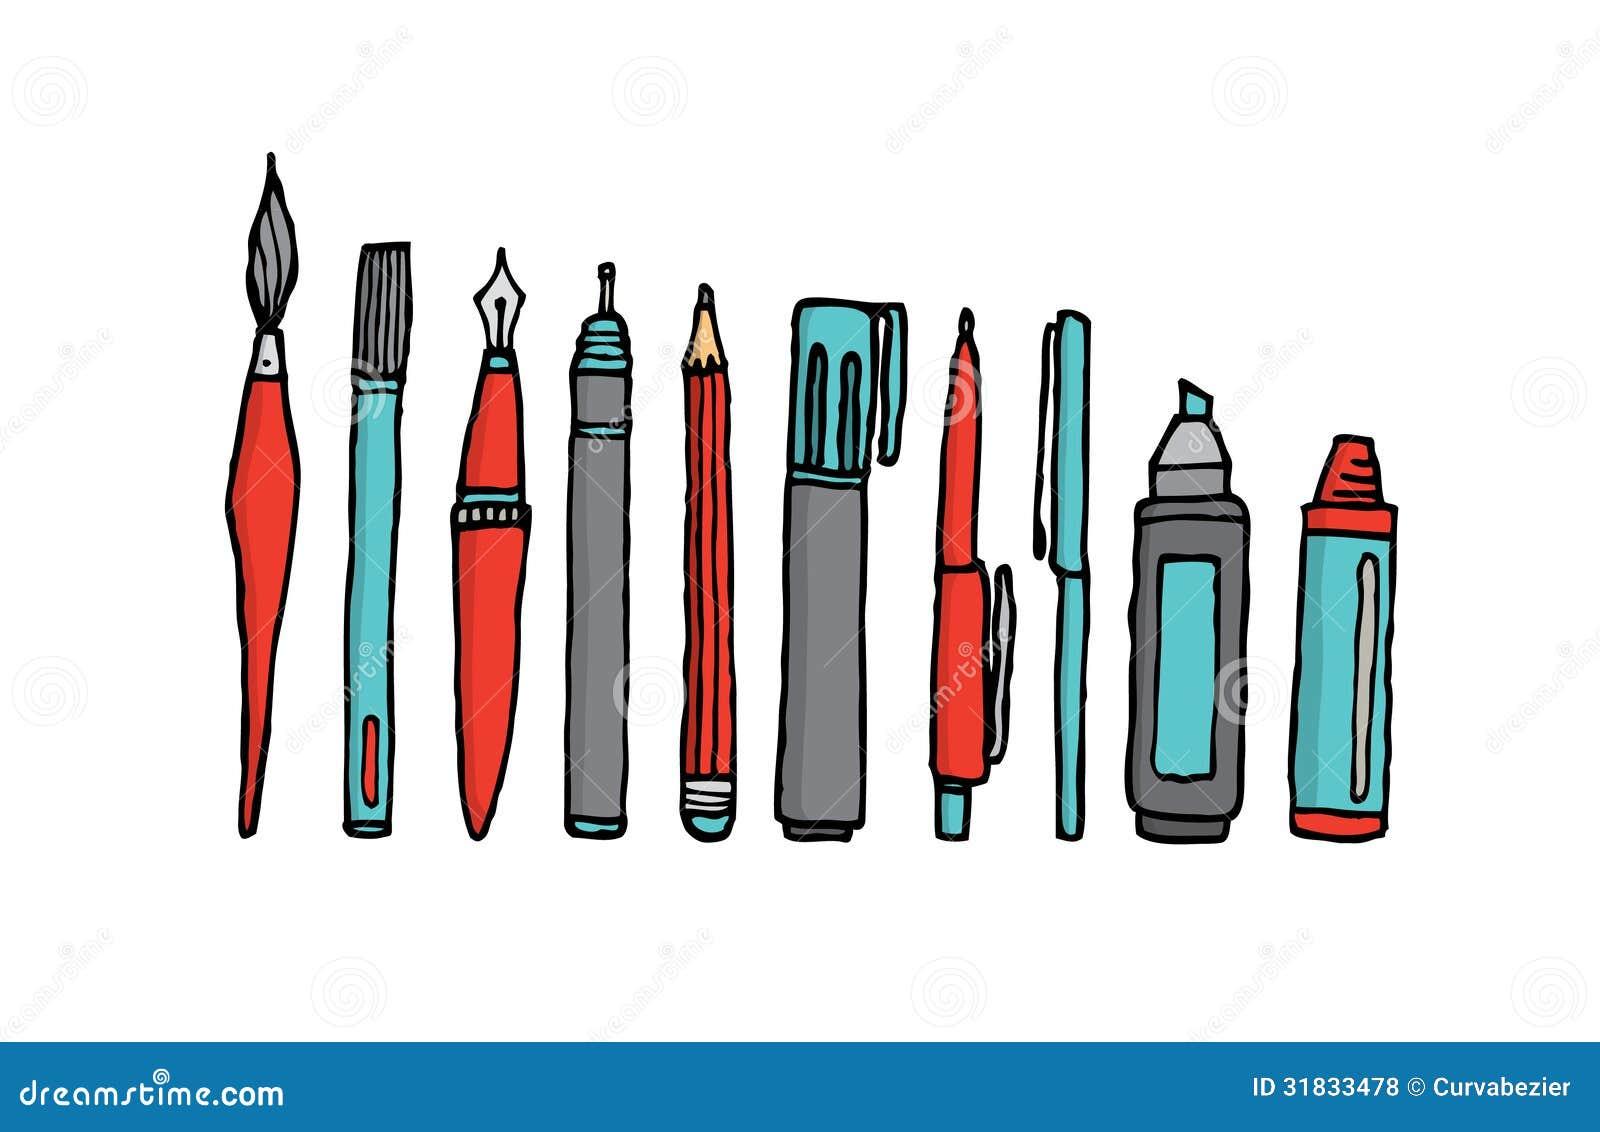 history of writing instruments History of writing instruments krishnamoorthy v.